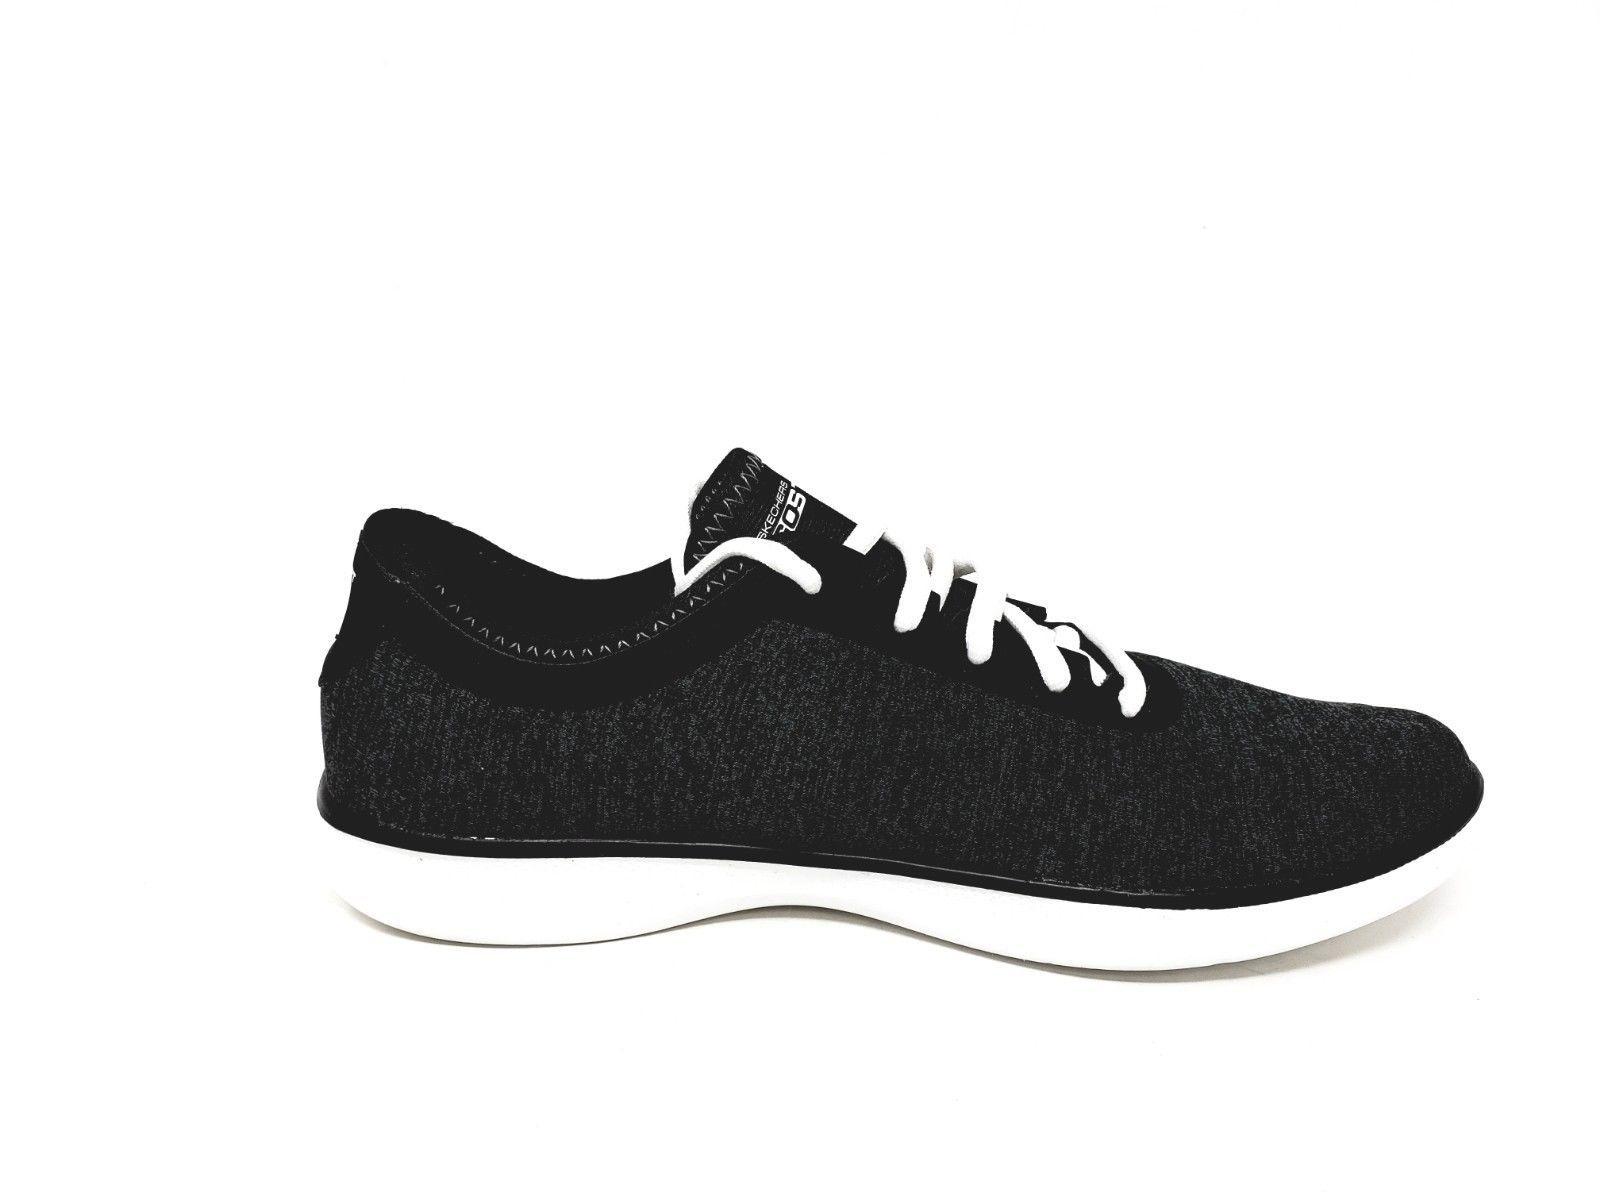 White 172R mm | eBay | Skechers women